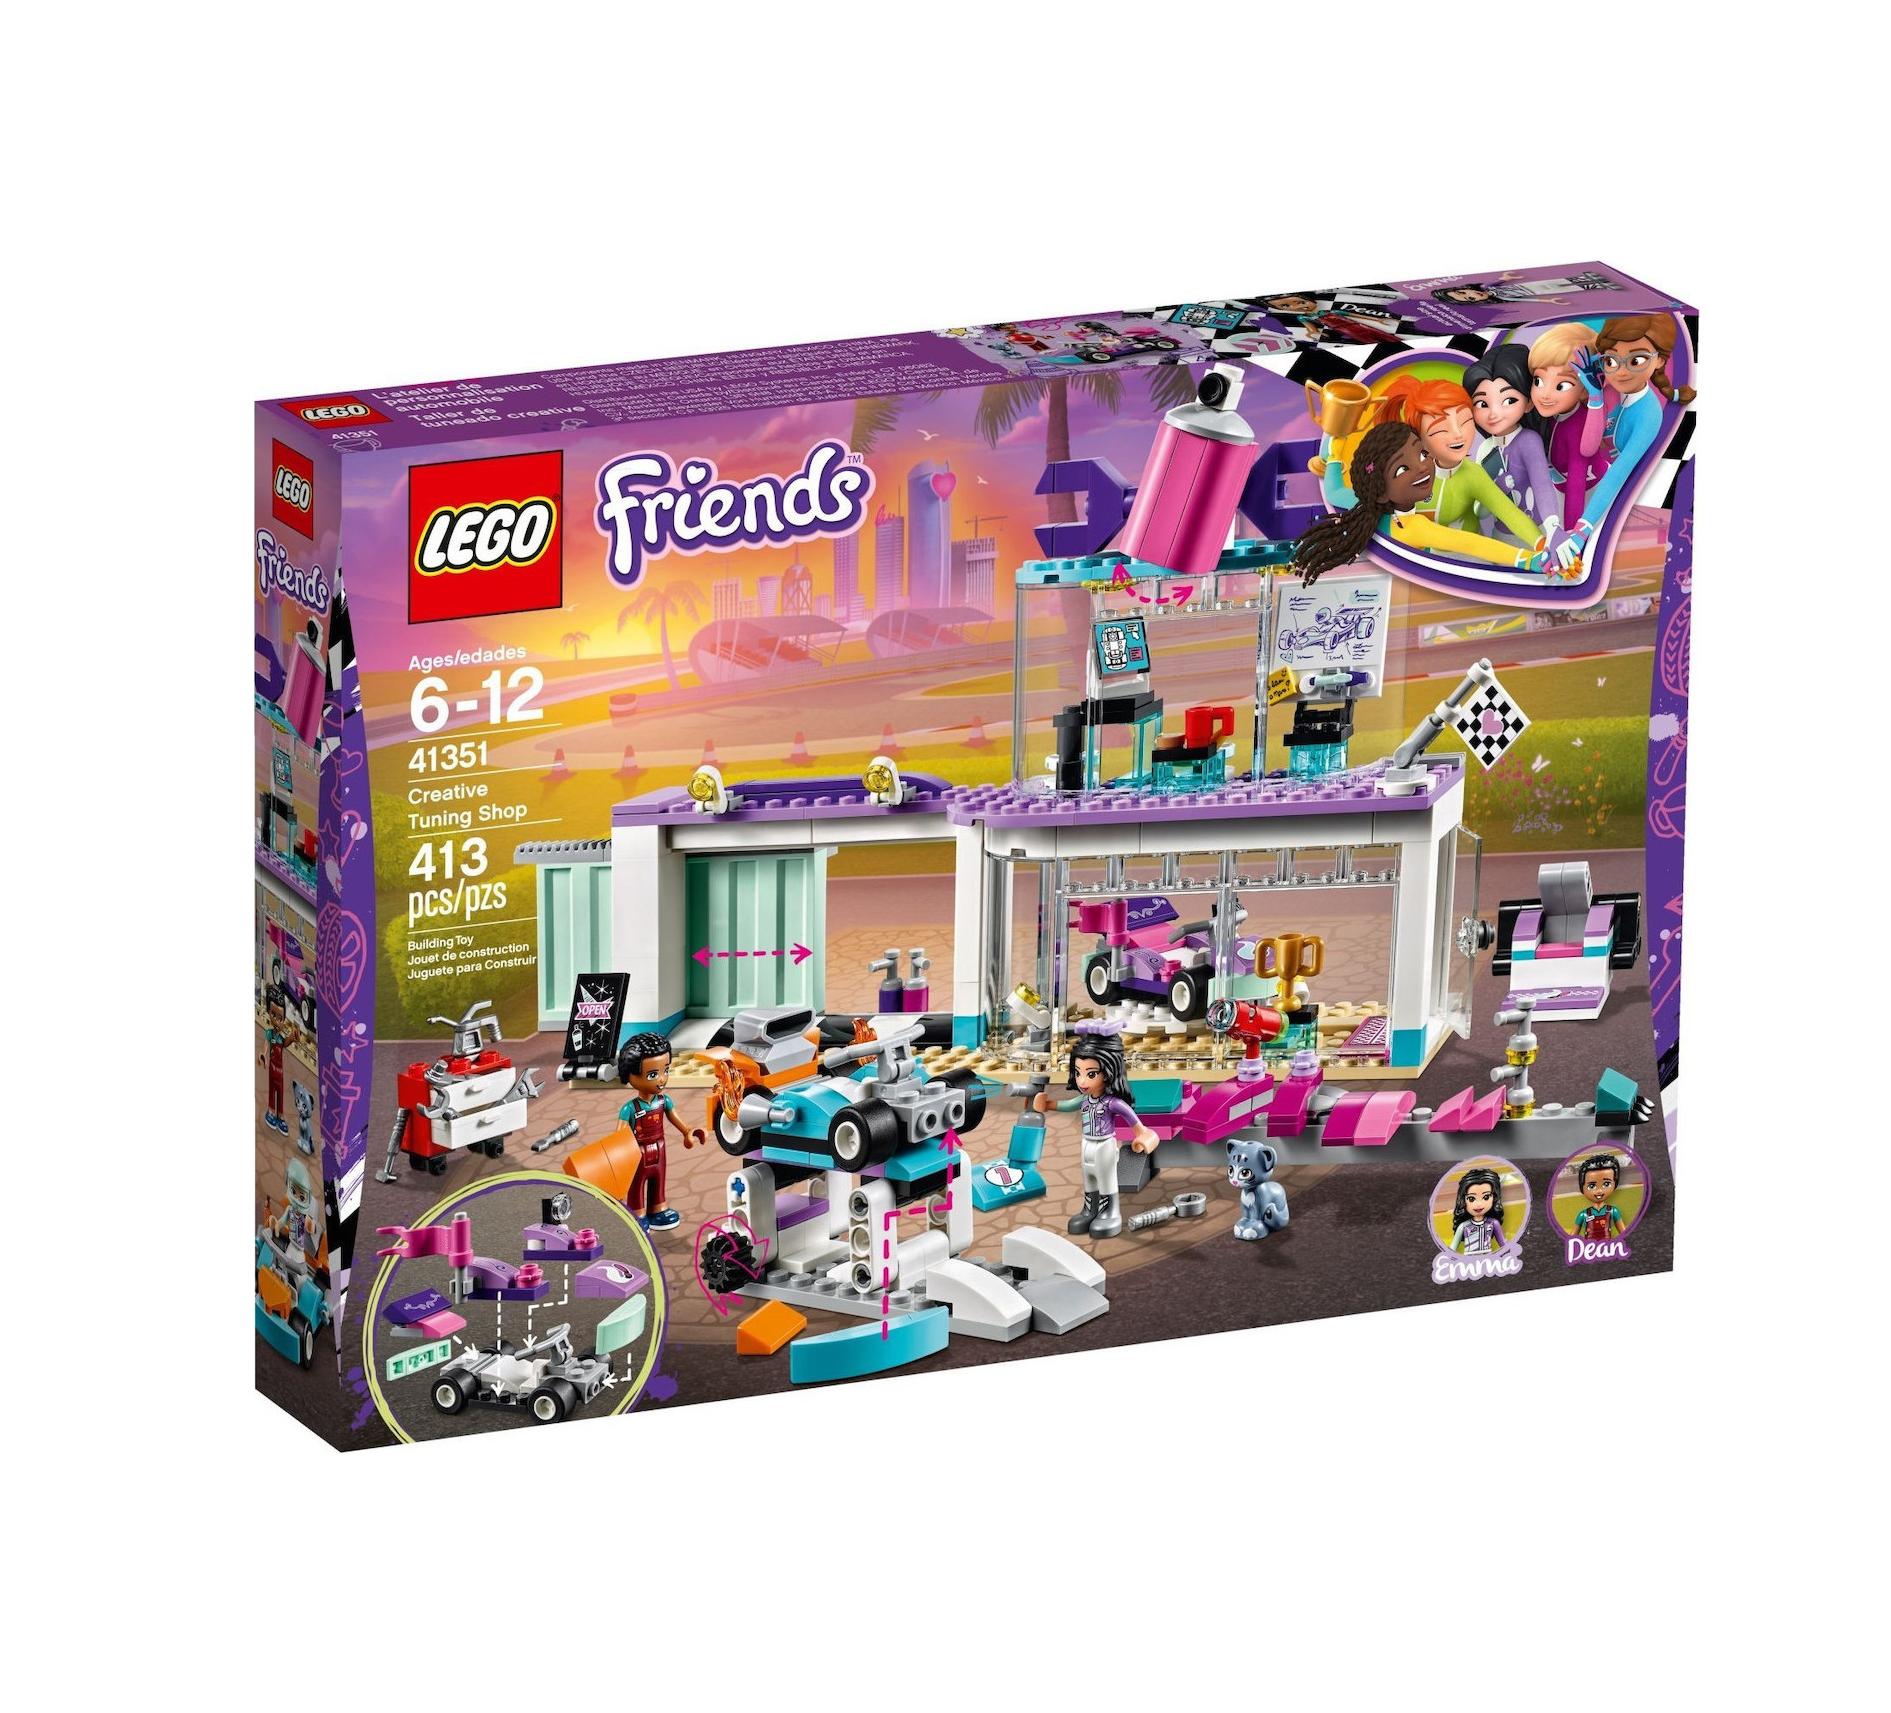 Lego Friends: Creative Tuning Shop 41351